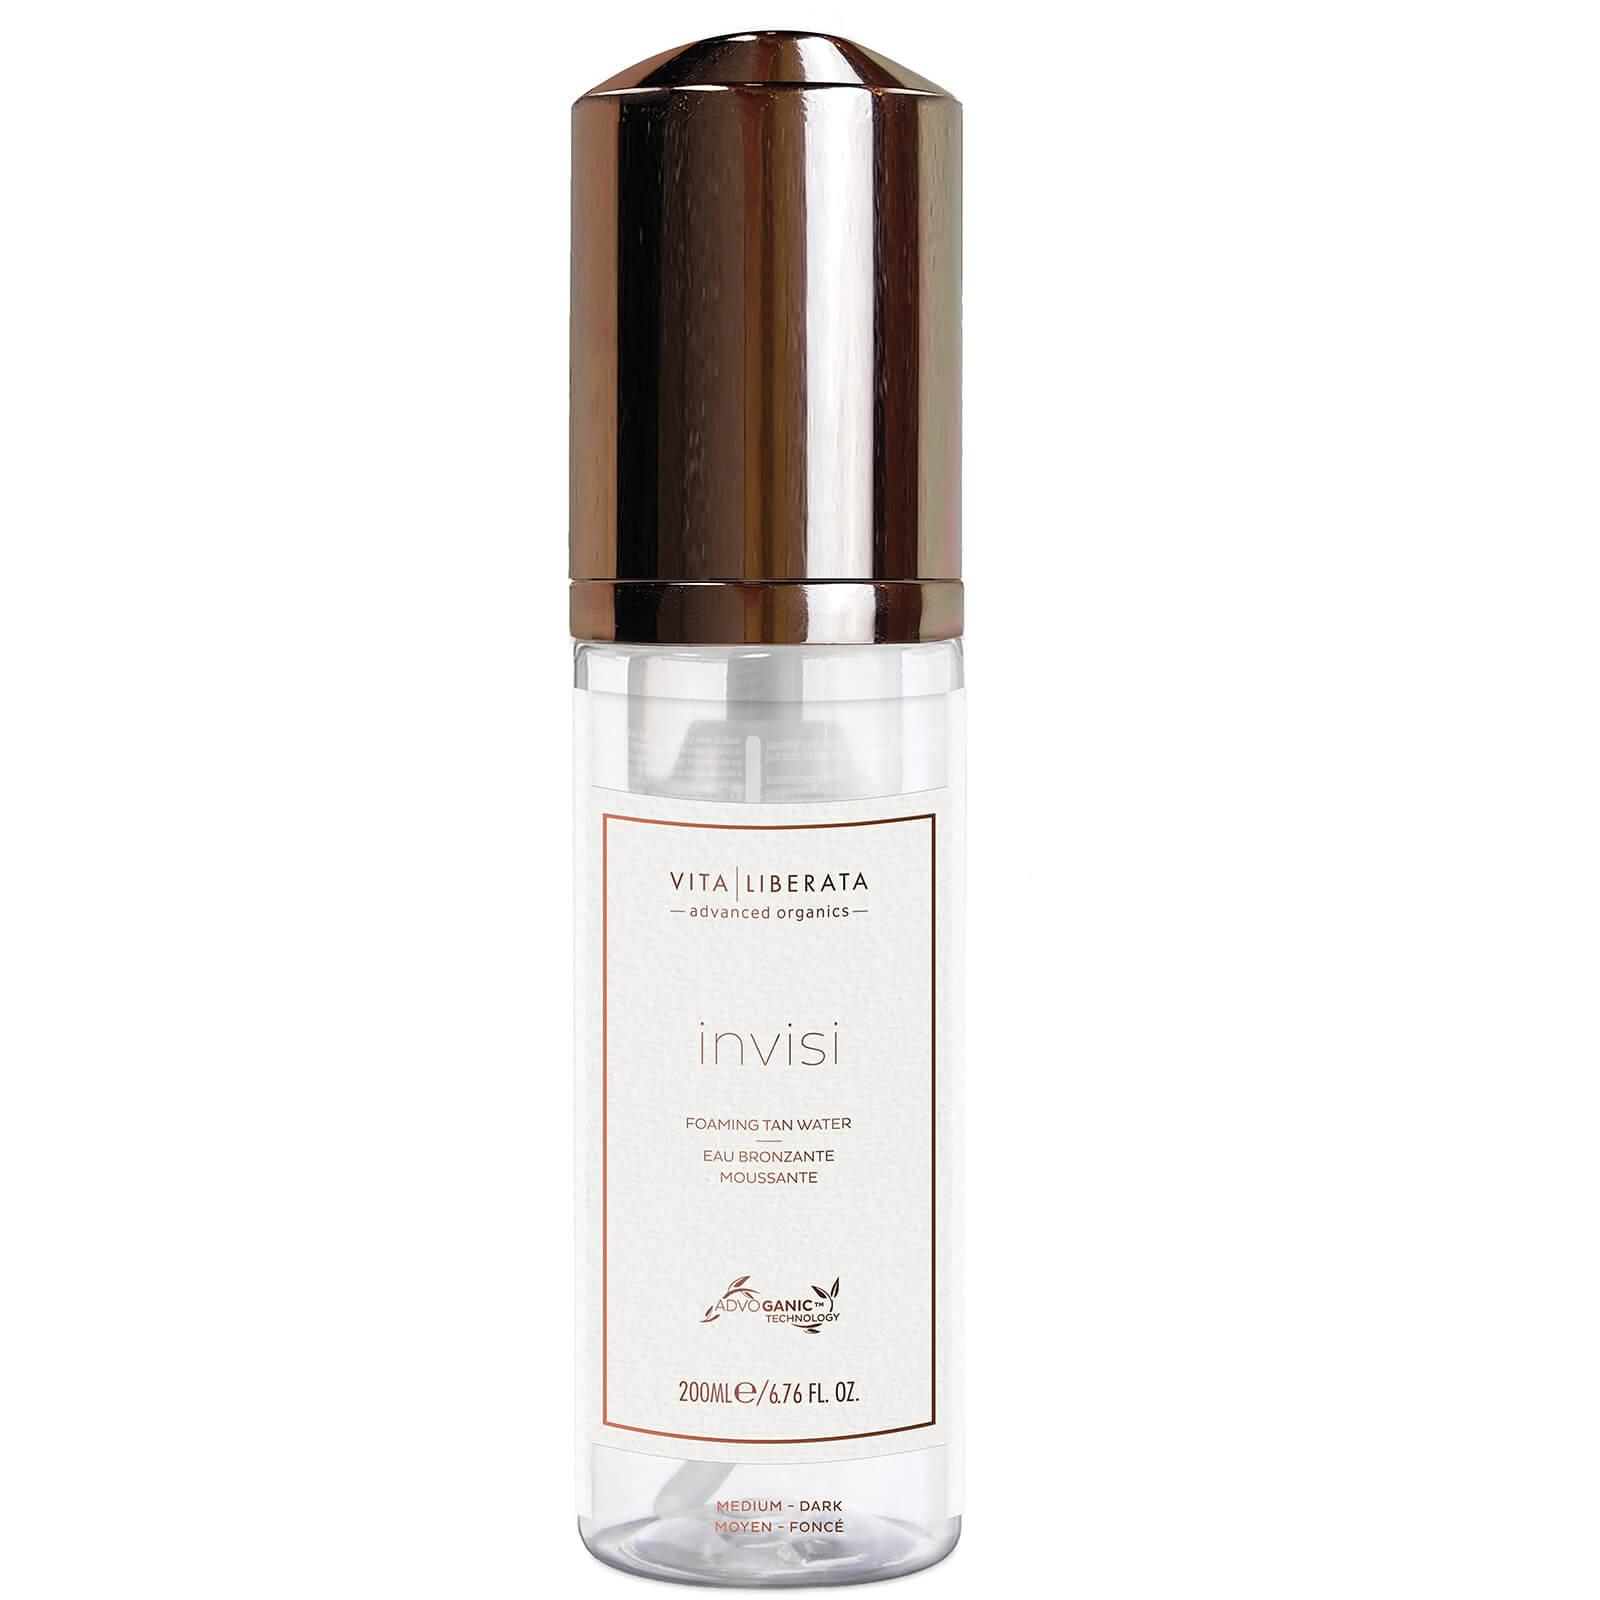 vita liberata invisi foaming tan water - medium/dark 200ml